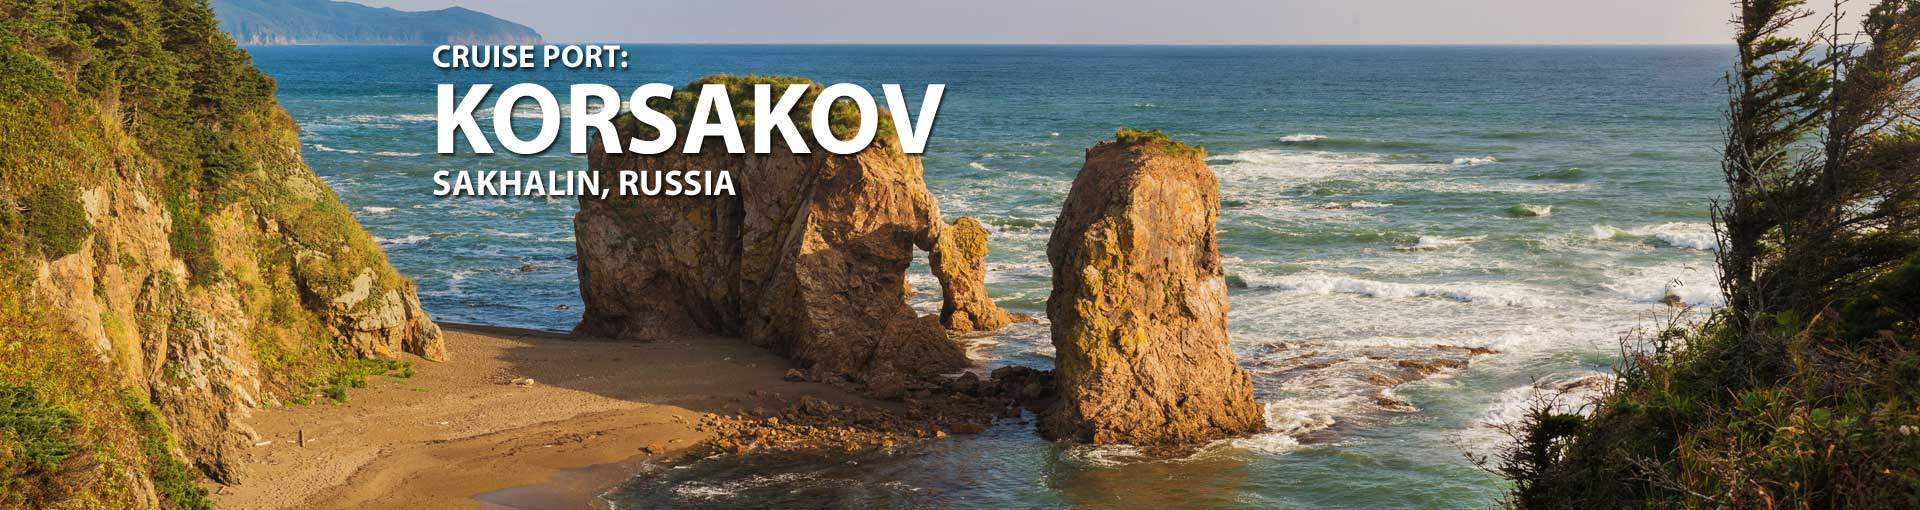 Cruises to Korsakov, Sakhalin, Russia